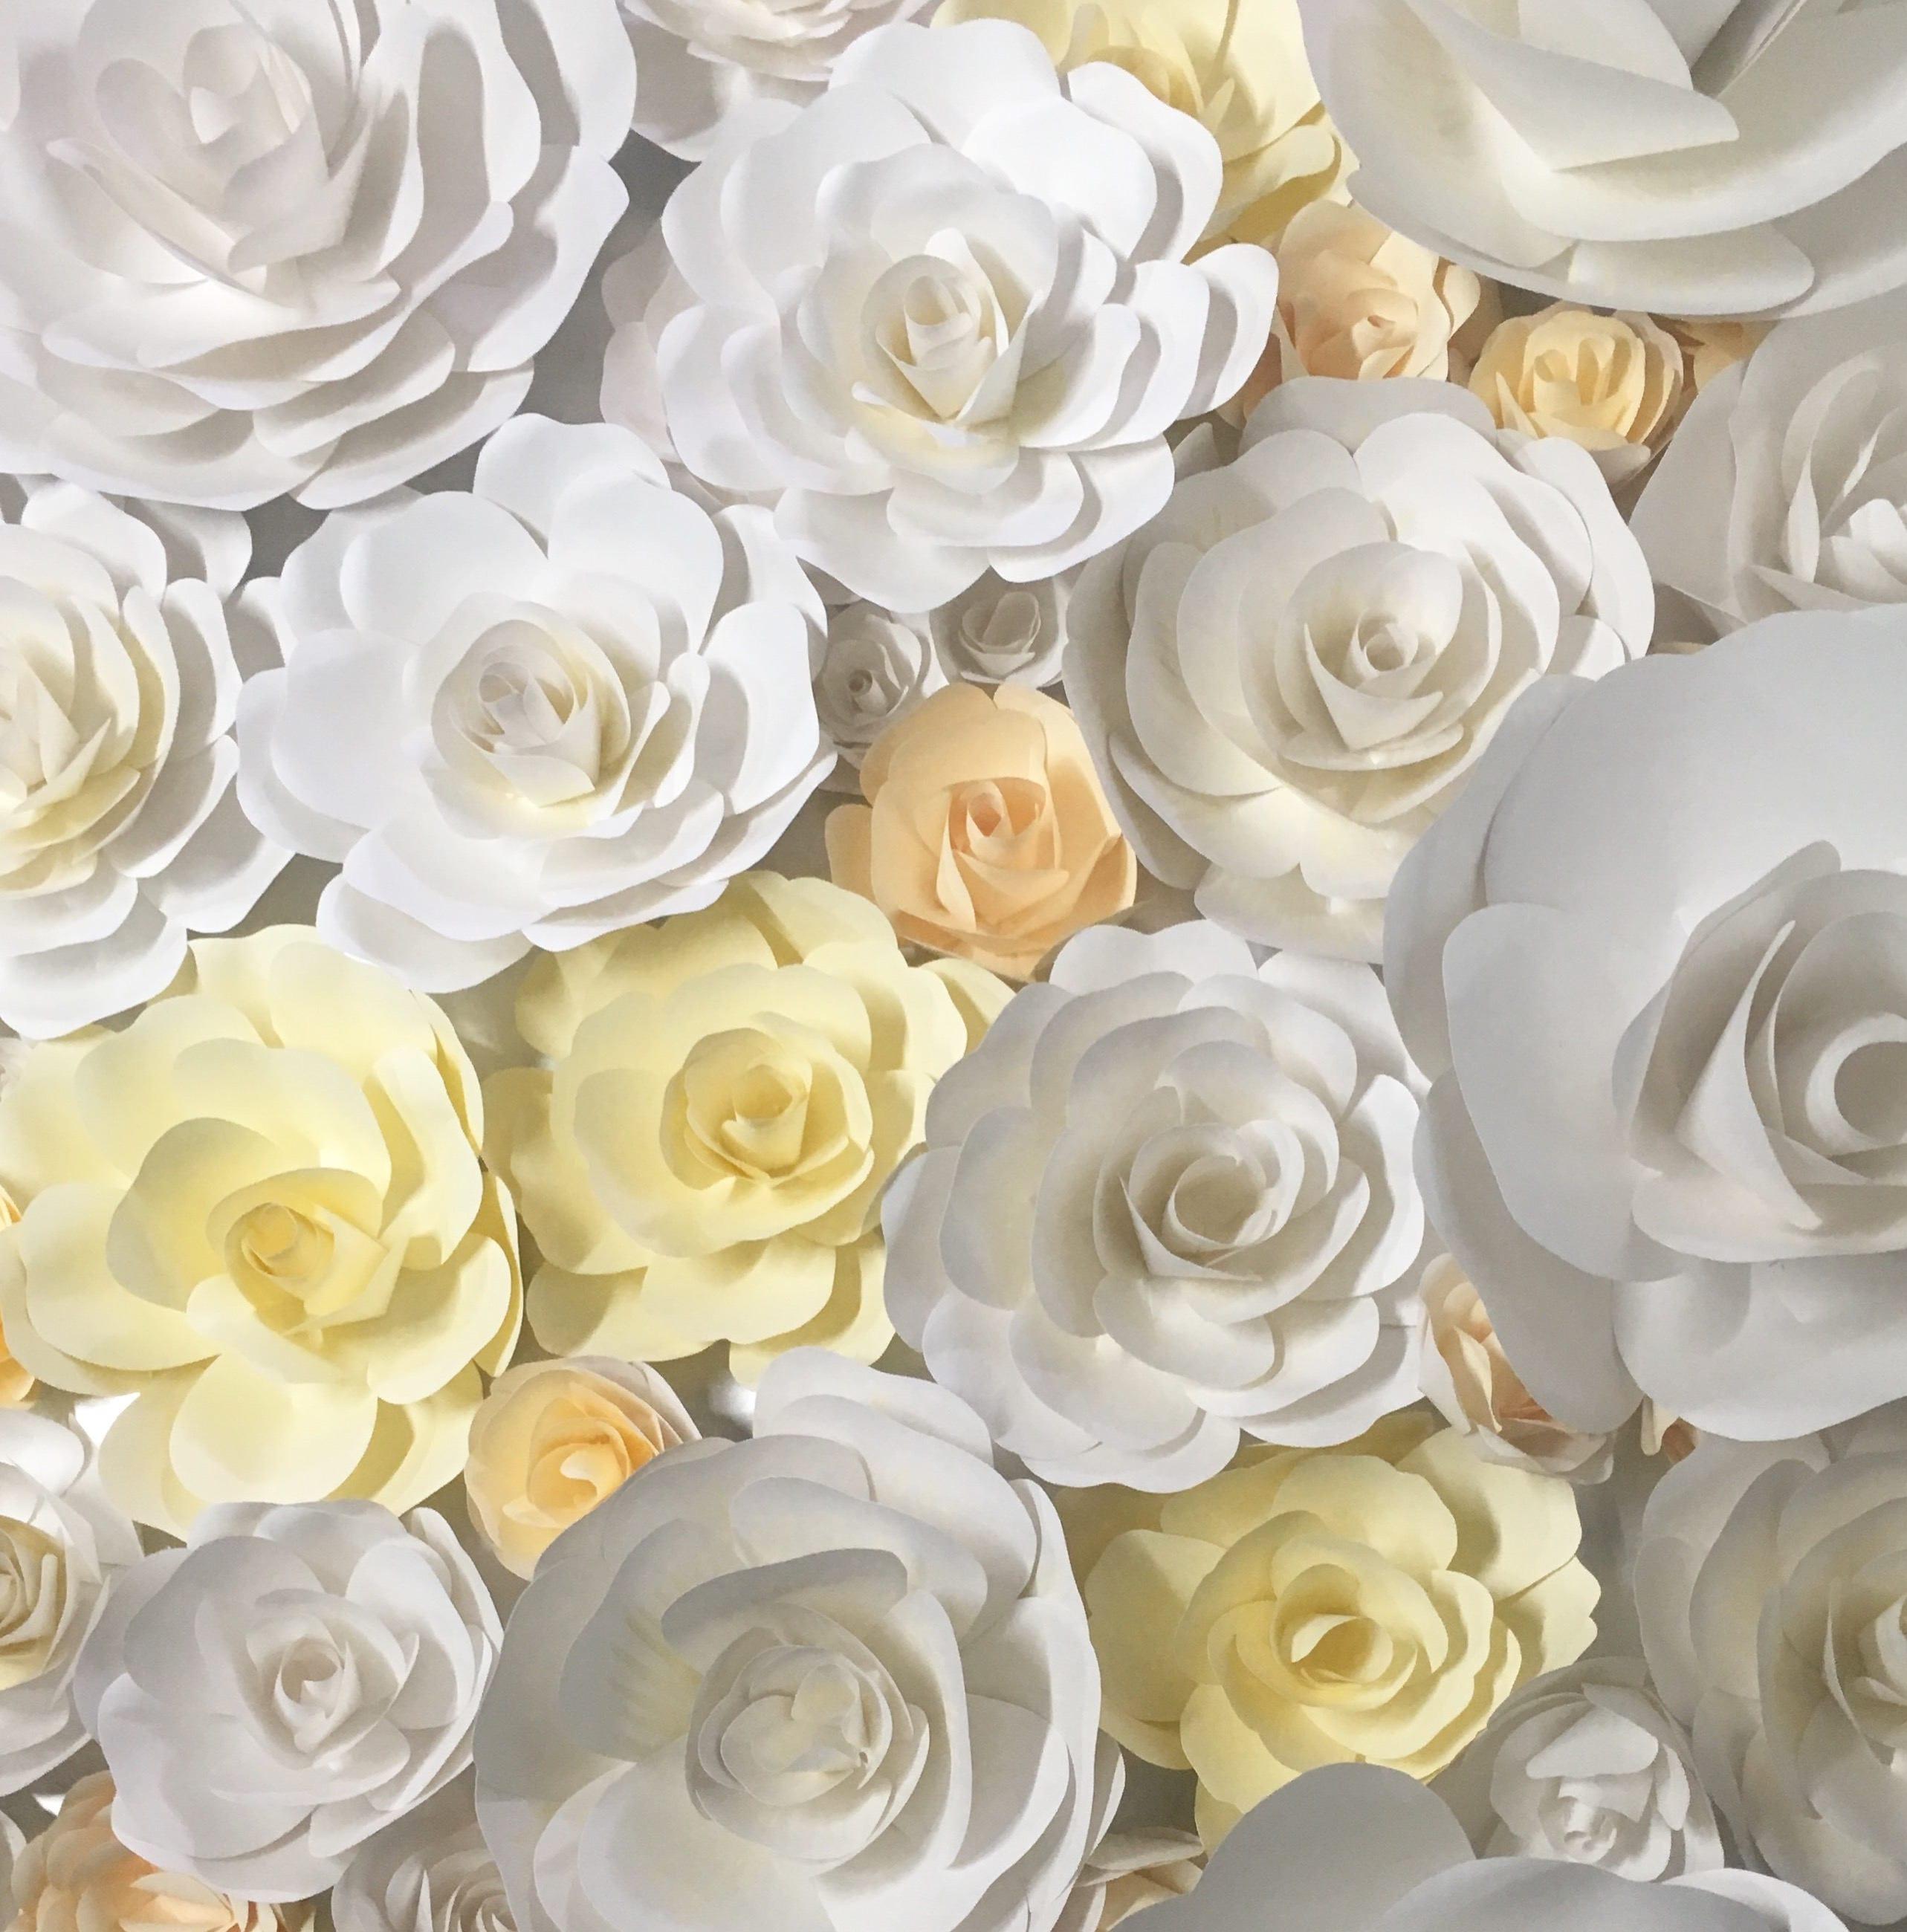 Paper Flower Wall Paper Flower Backdrop wedding decoration   Etsy